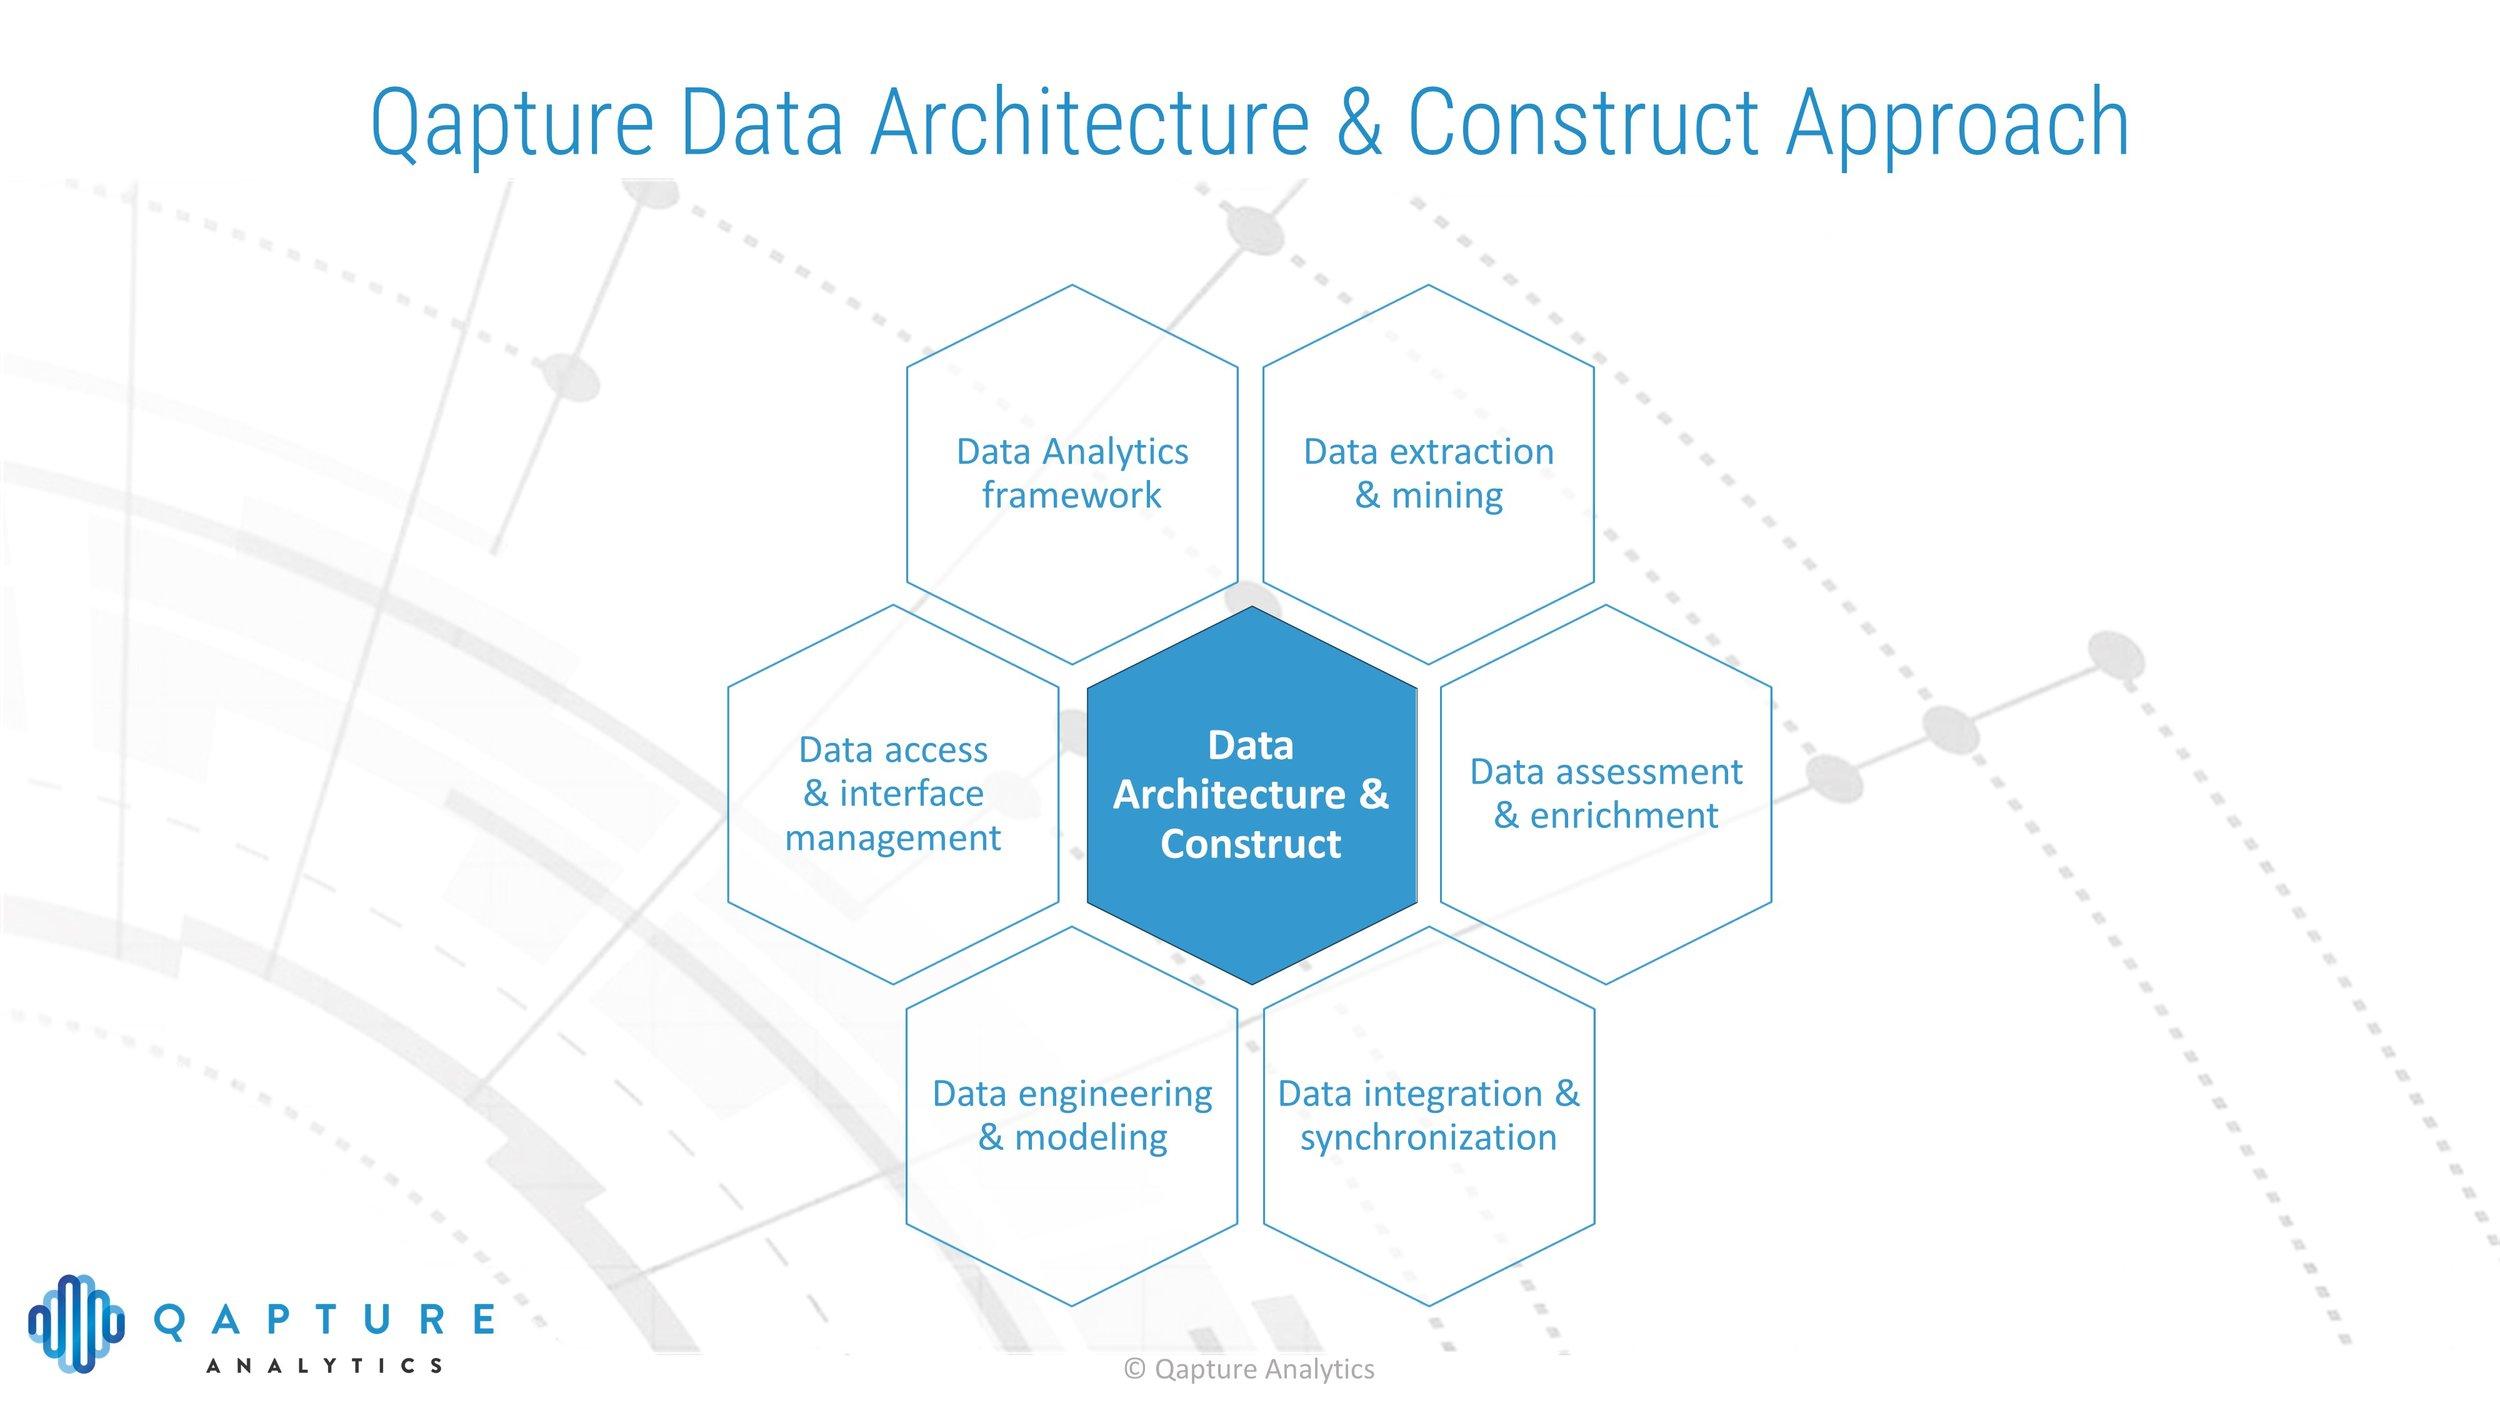 QAPTURE Data Analytics Approach3.jpg